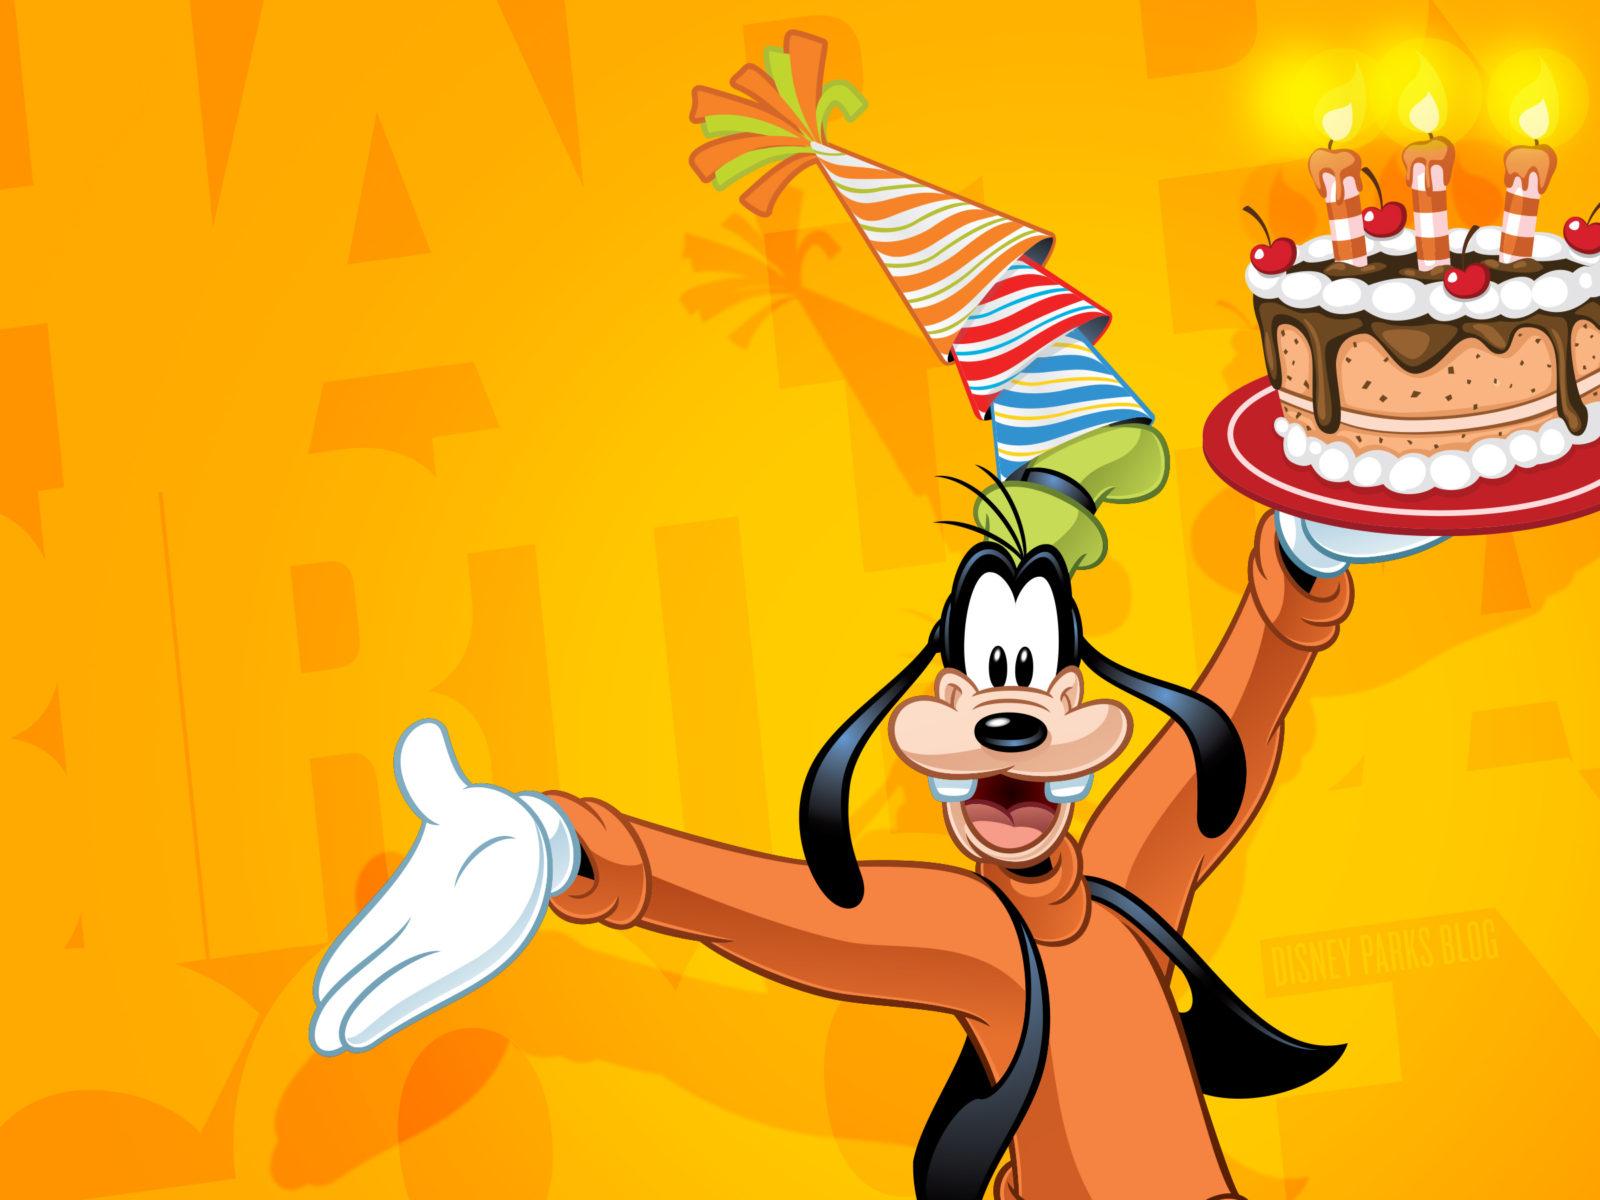 Aladdin Wallpaper Hd Goofy Celebrate Happy Birthday Disney Wallpaper 2880x1800